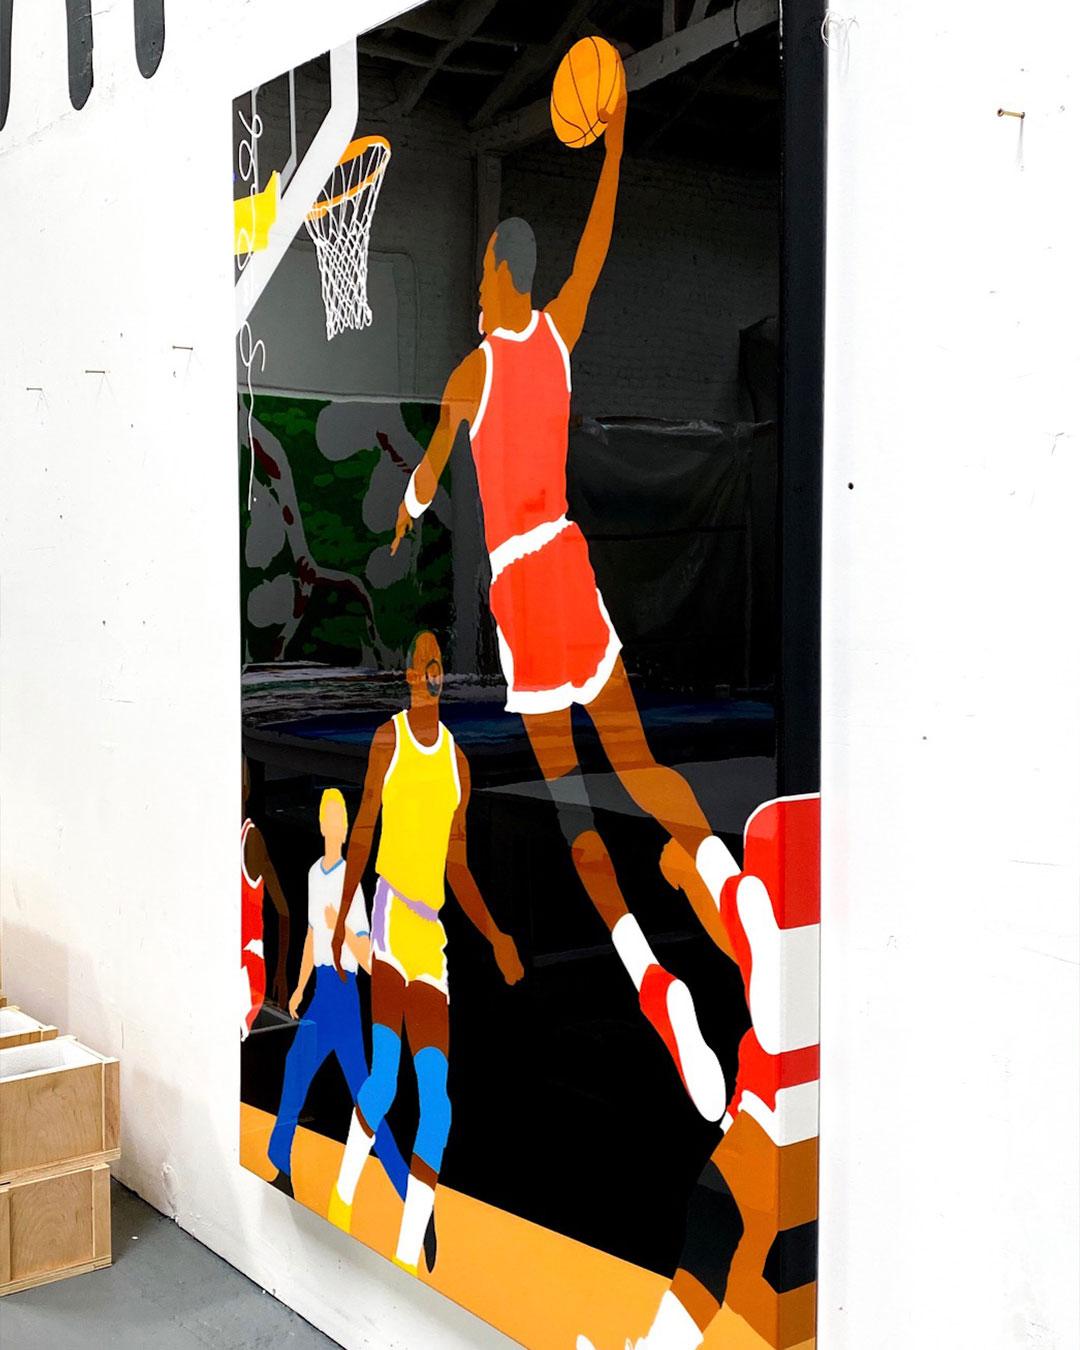 Basketball by Shelby & Sandy